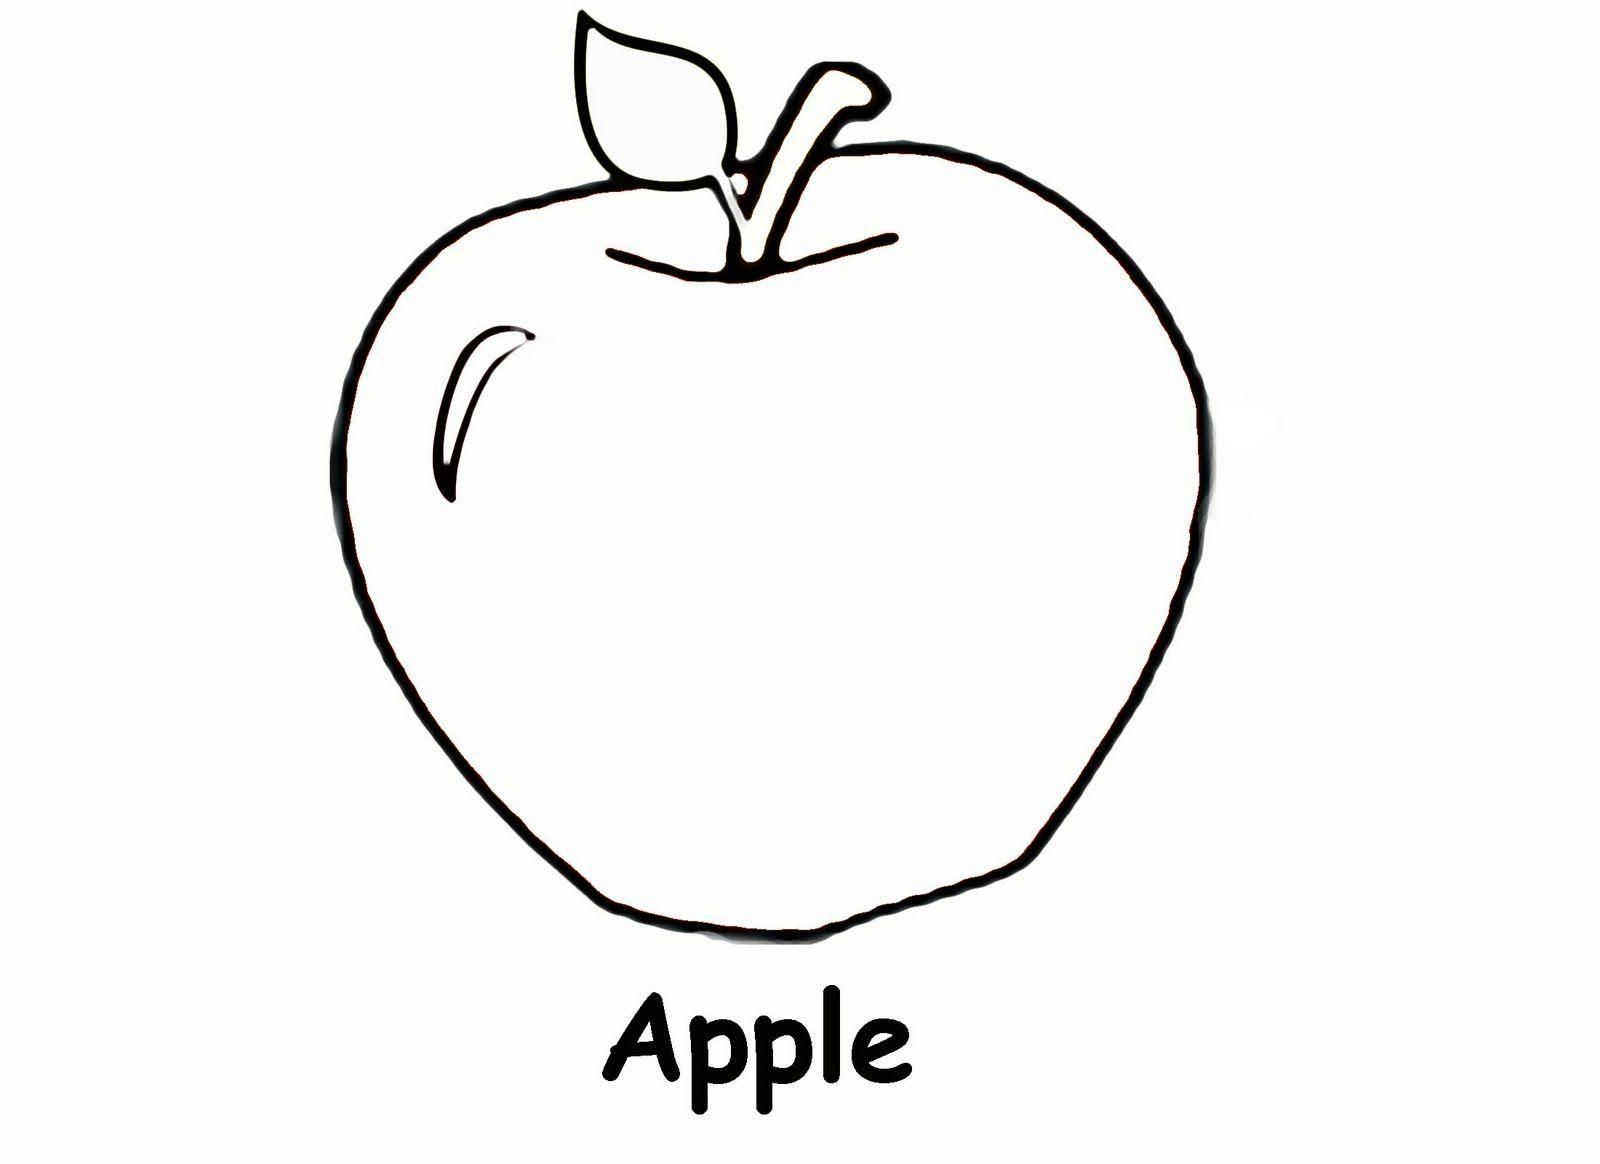 Coloring Page Apple Apple Coloring Pages Coloring Pages For Girls Preschool Coloring Pages